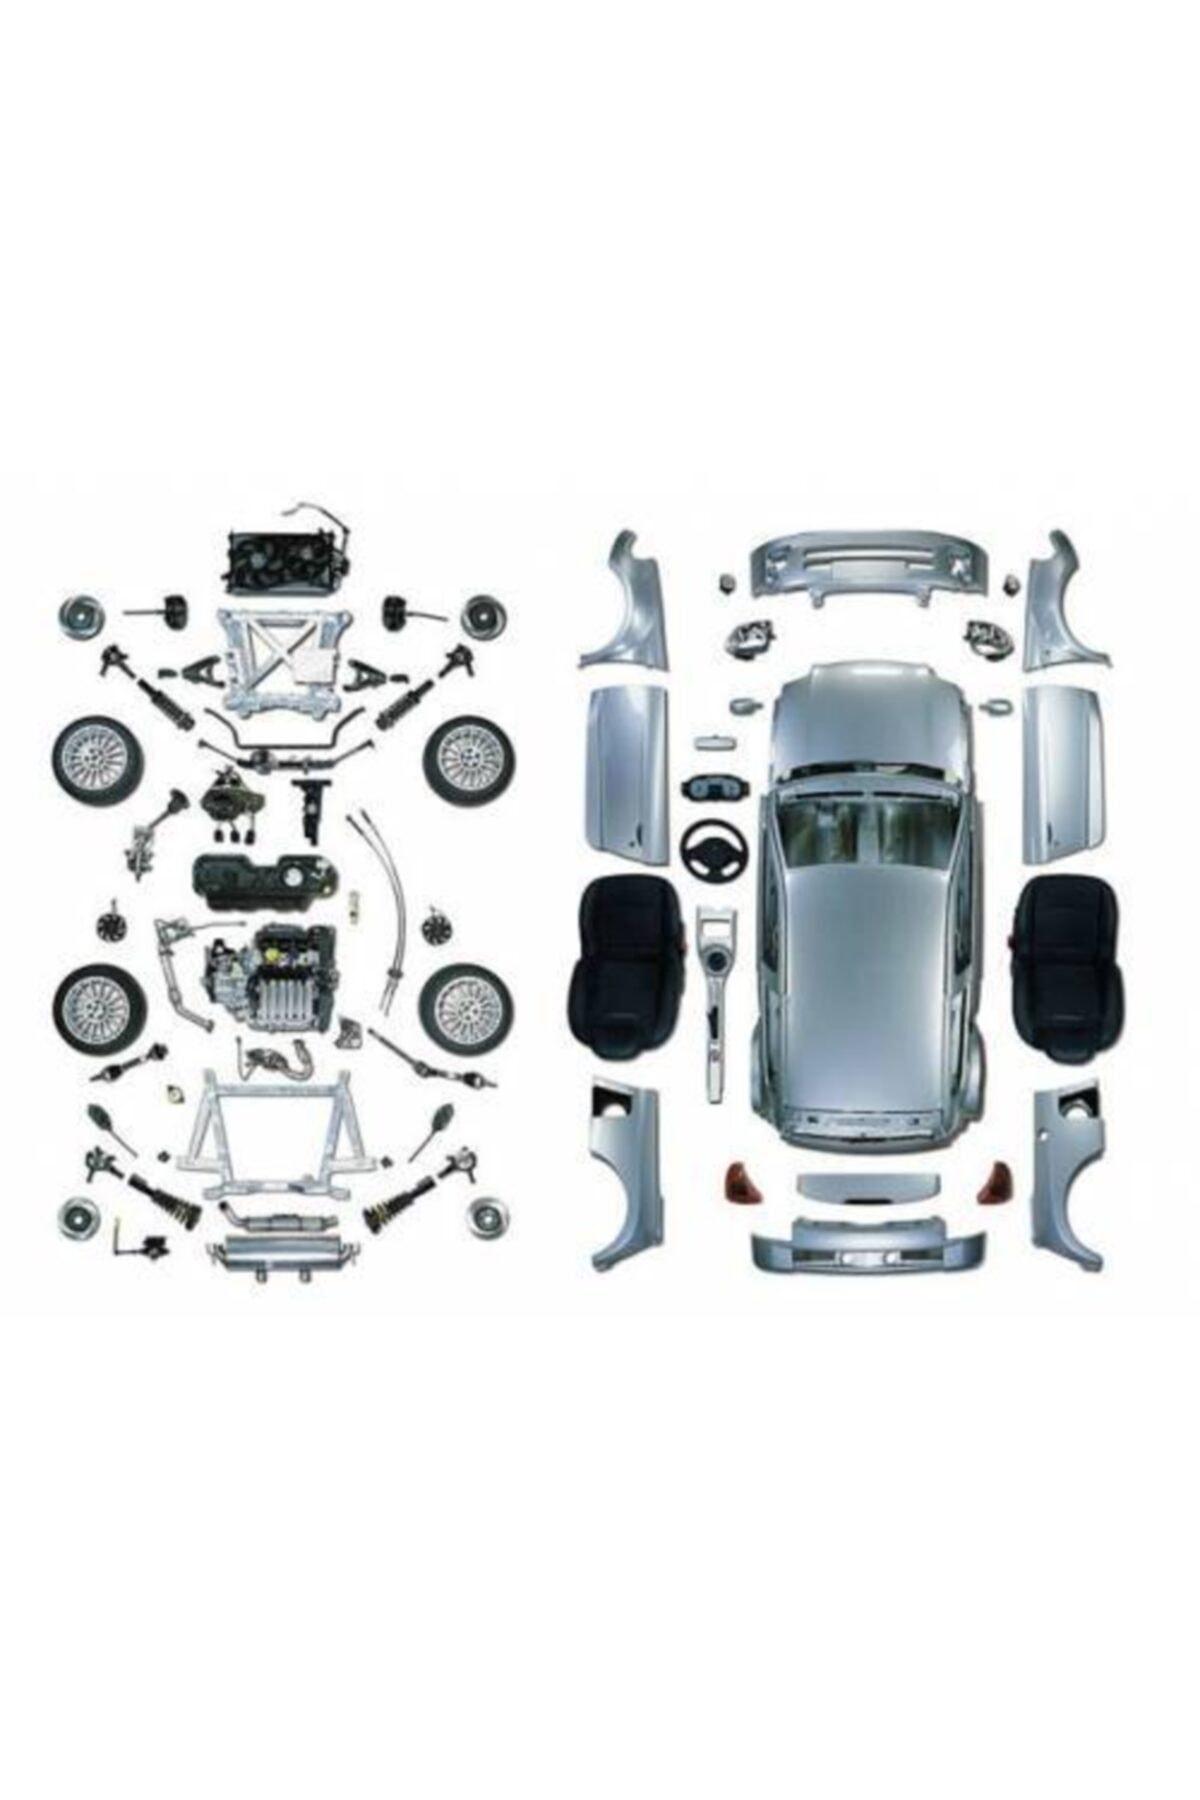 OEM Corolla Dıreksıyon Baglantı Lastıgı Takım 952372 Mga 1